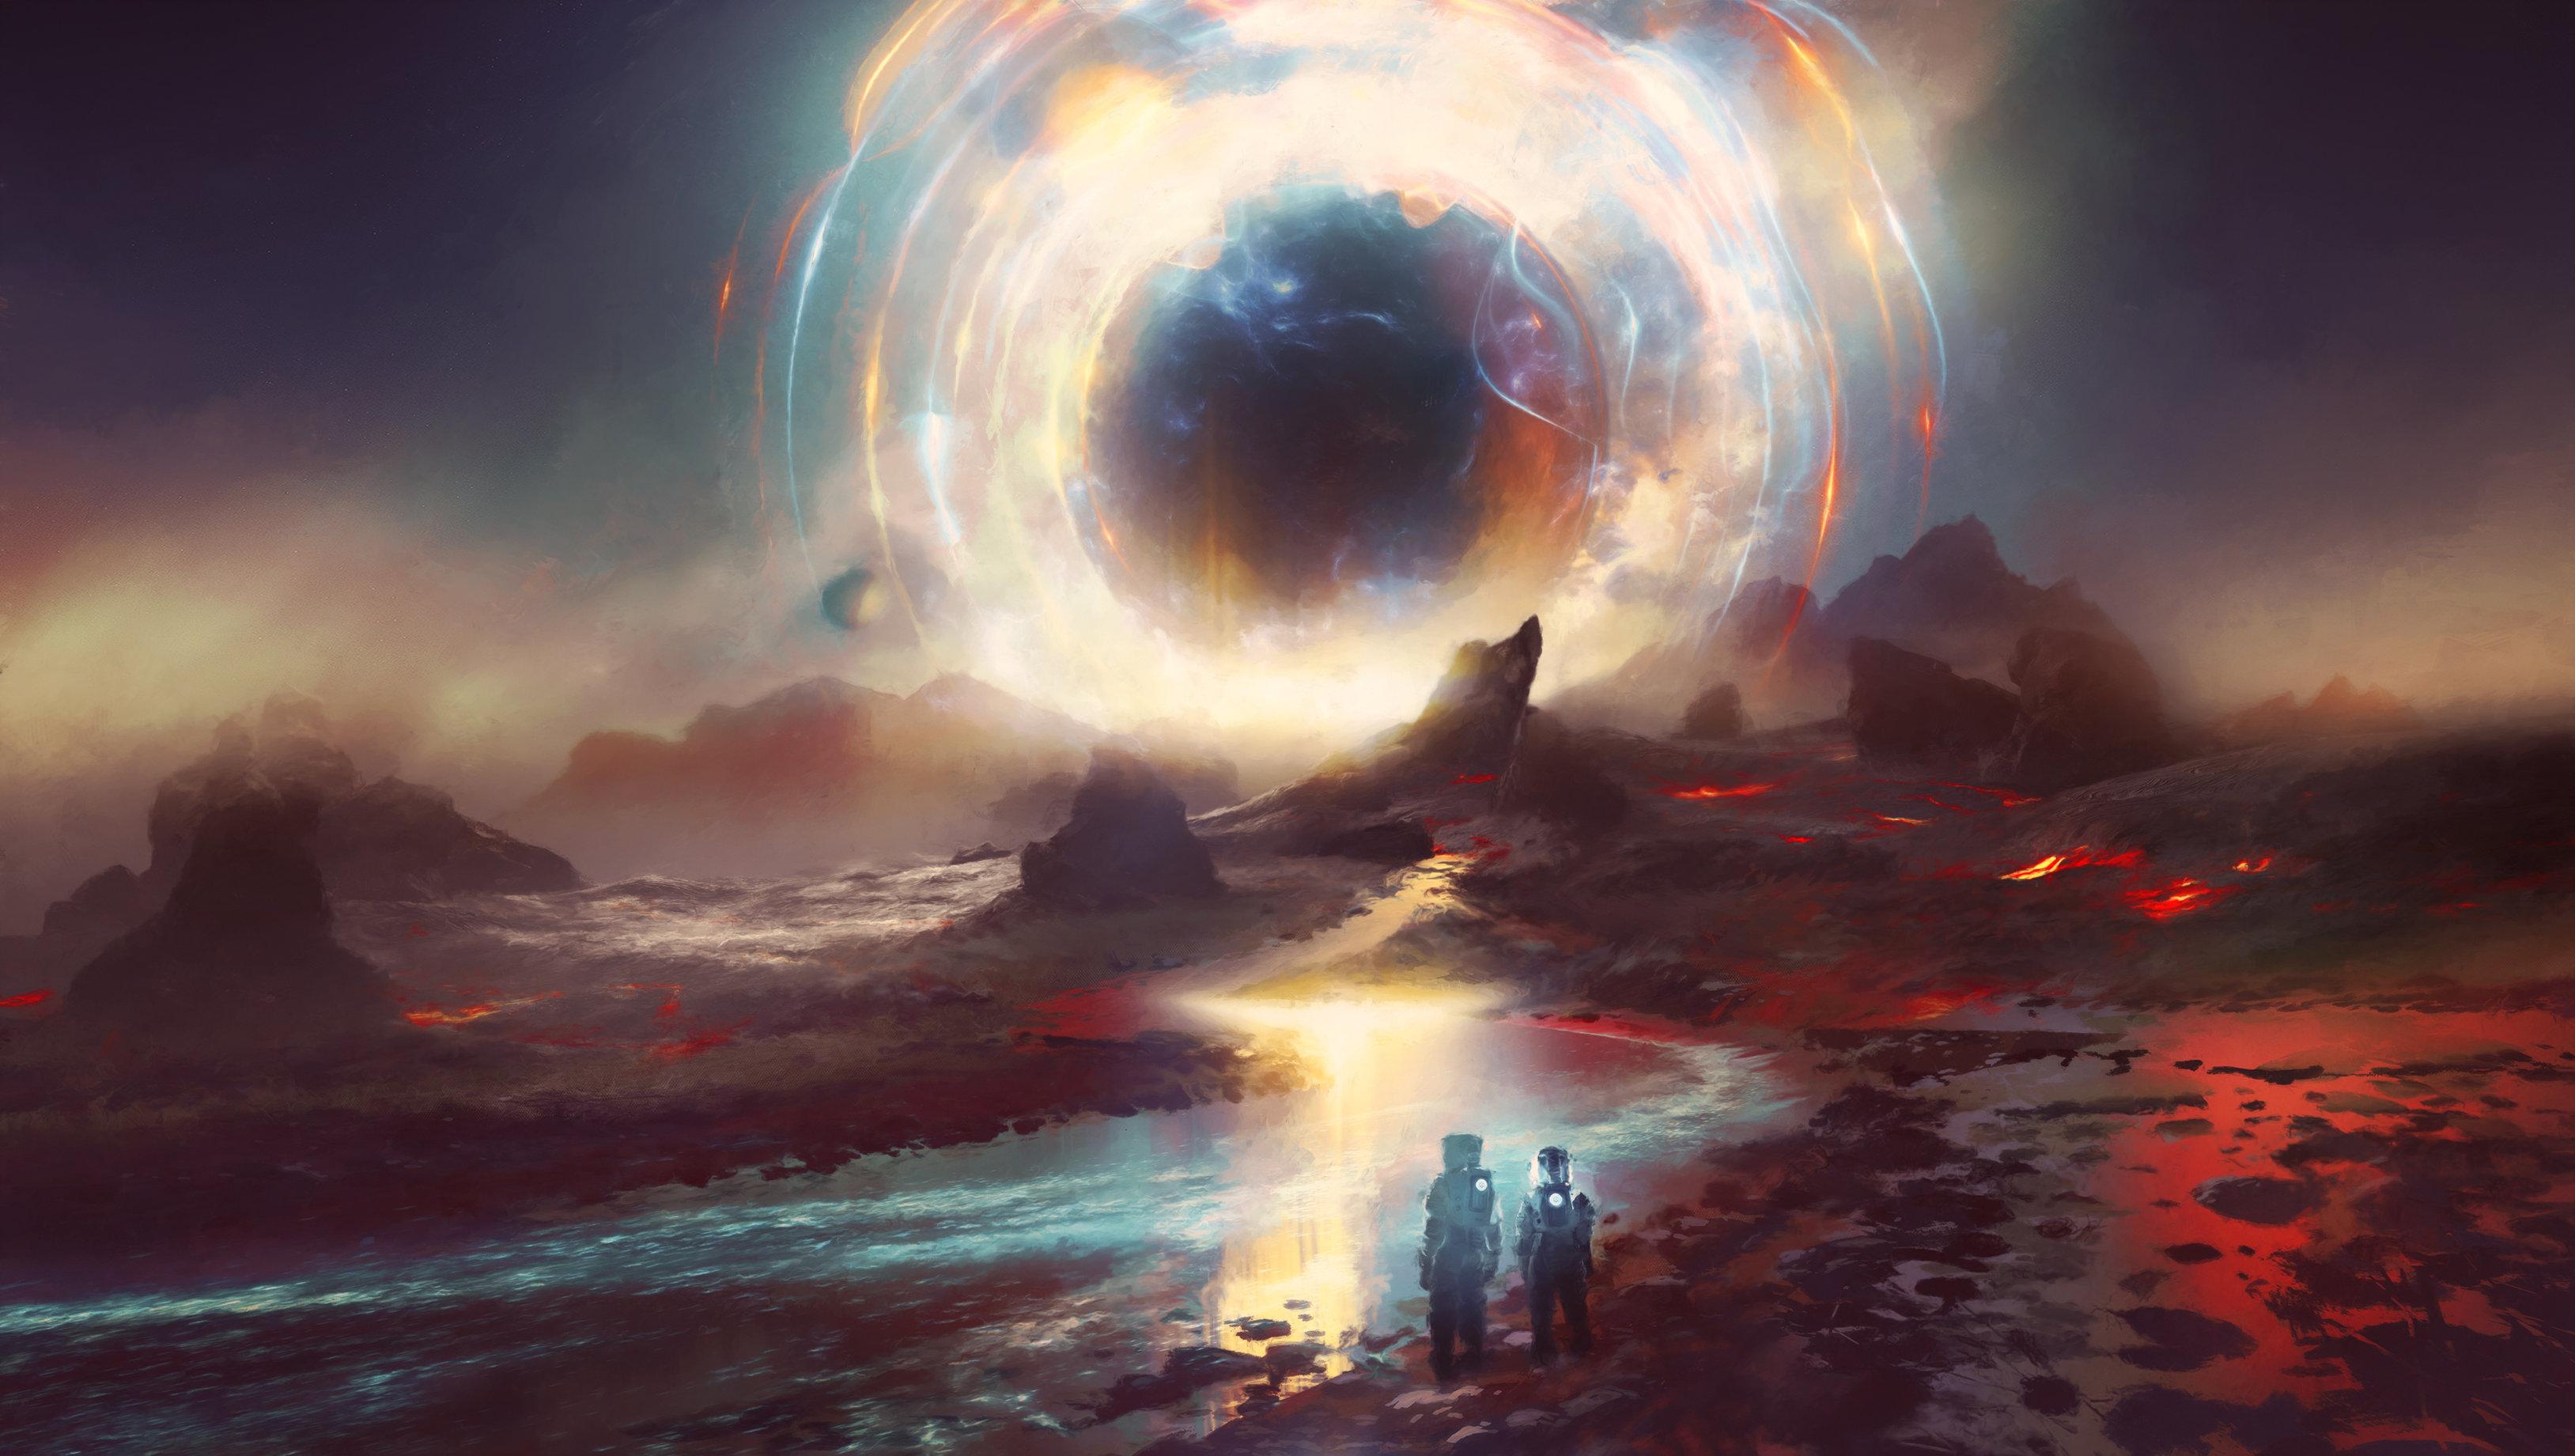 Black Sun Horizon 4k Hd Artist 4k Wallpapers Images